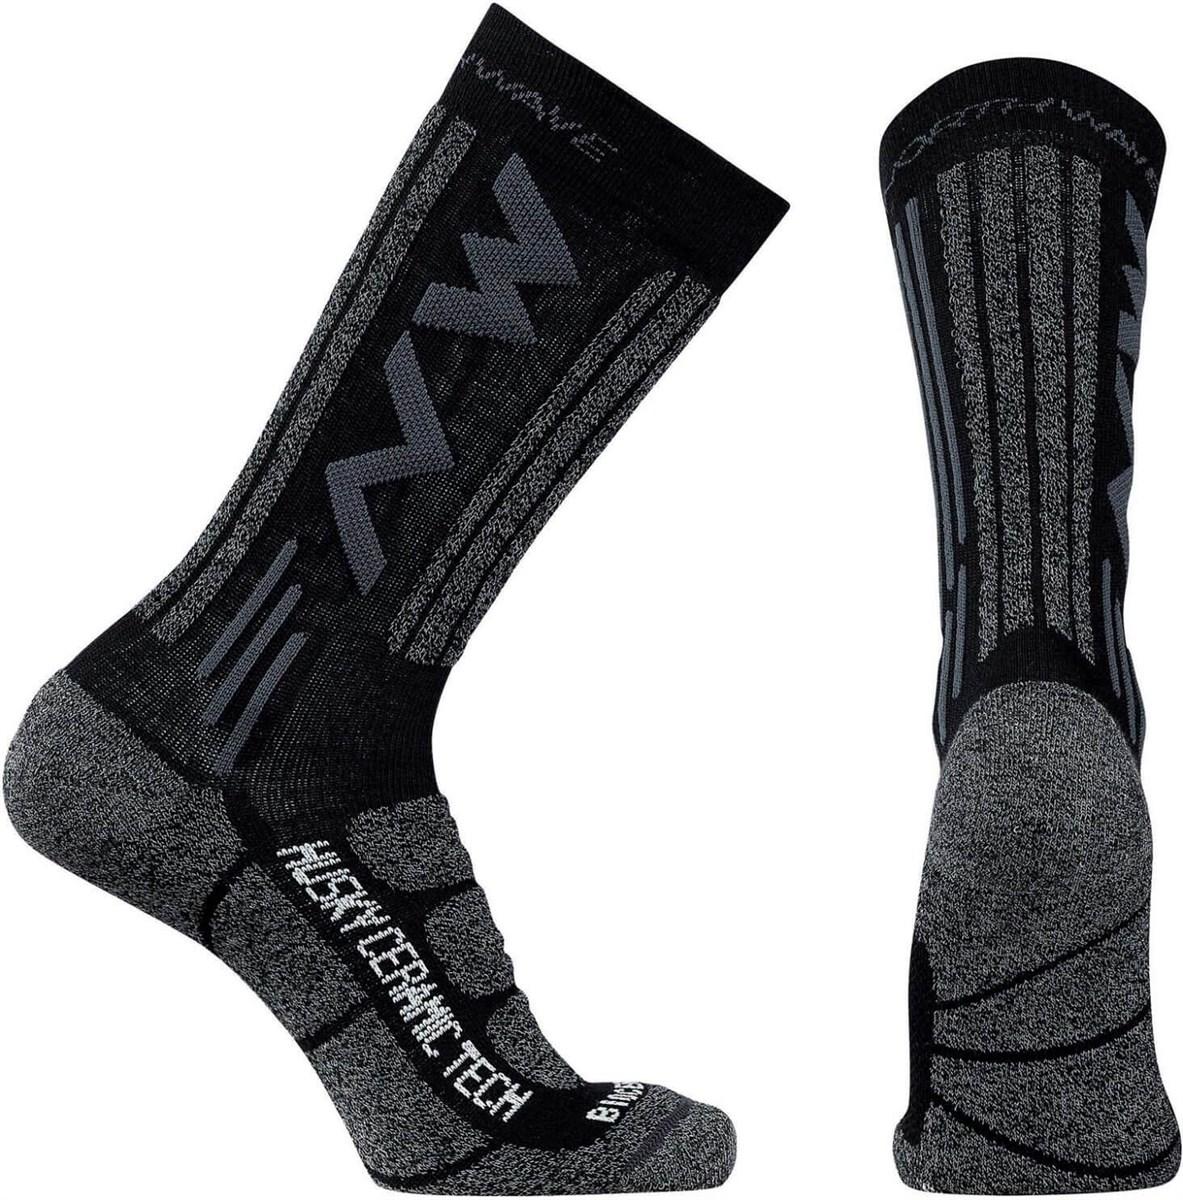 Northwave Husky Ceramic Tech 2 High Socks   Socks